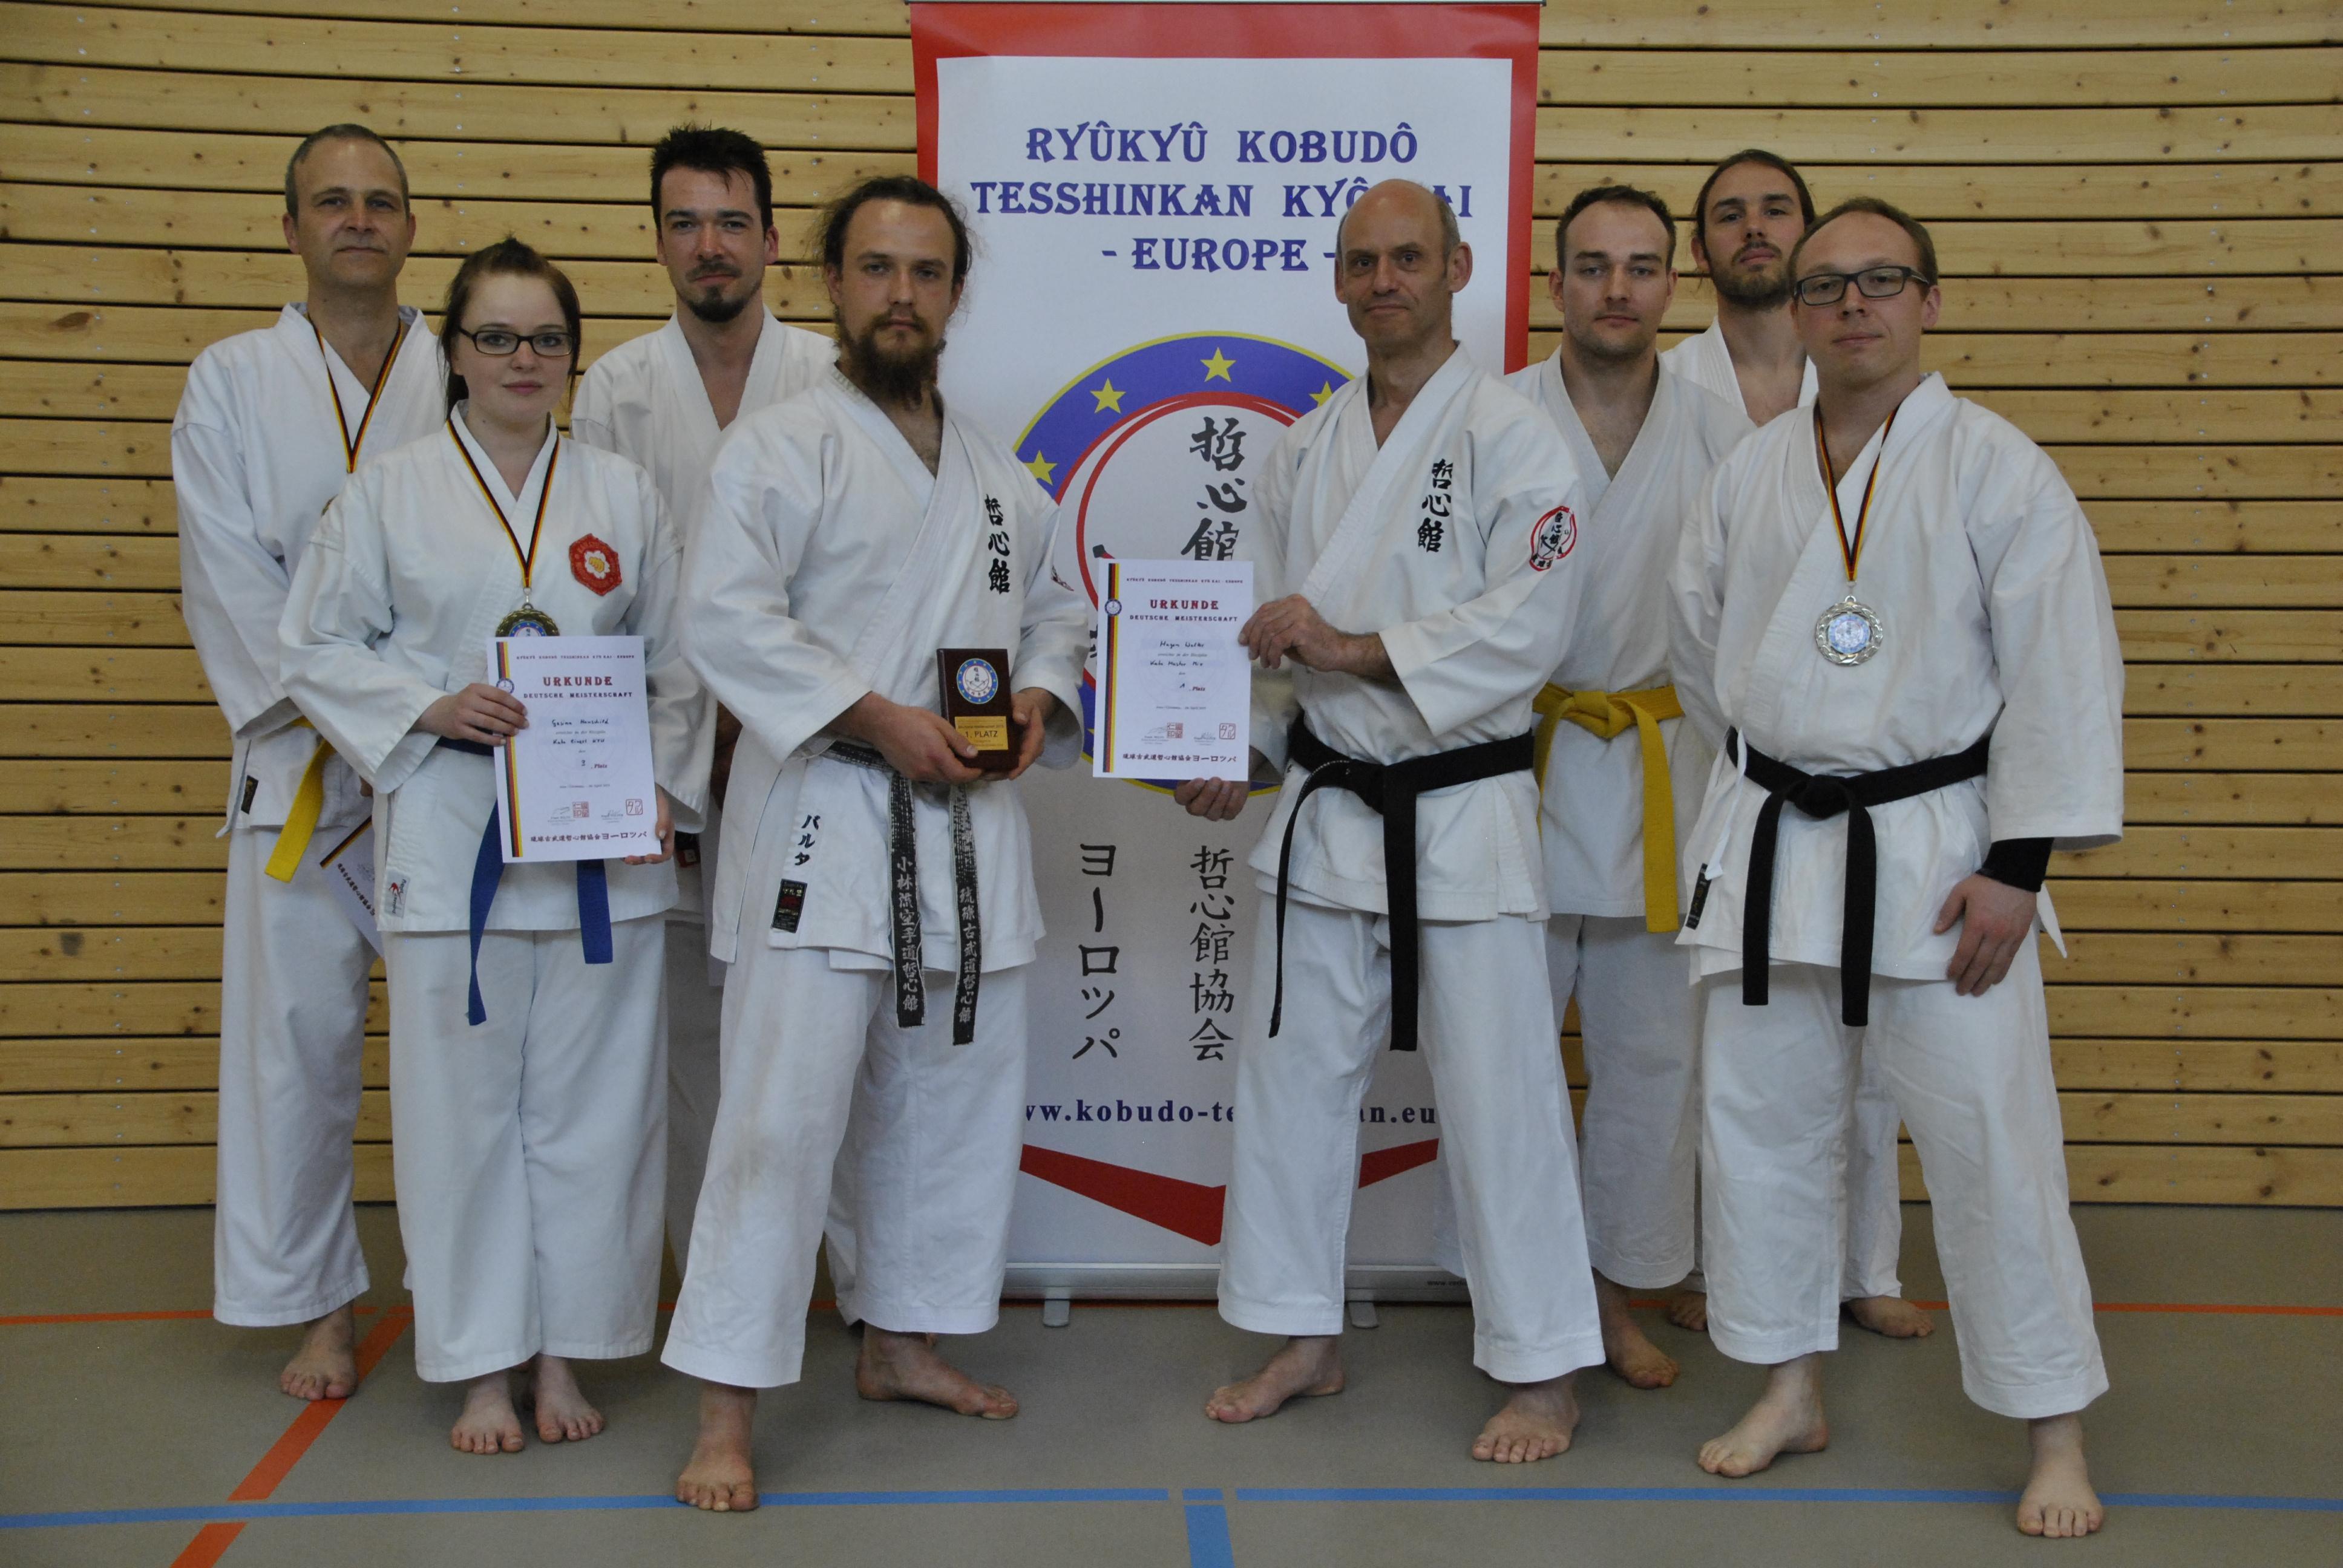 Erfolgreiche Jenaer bei der Tesshinkan Kobudo-DM 2015